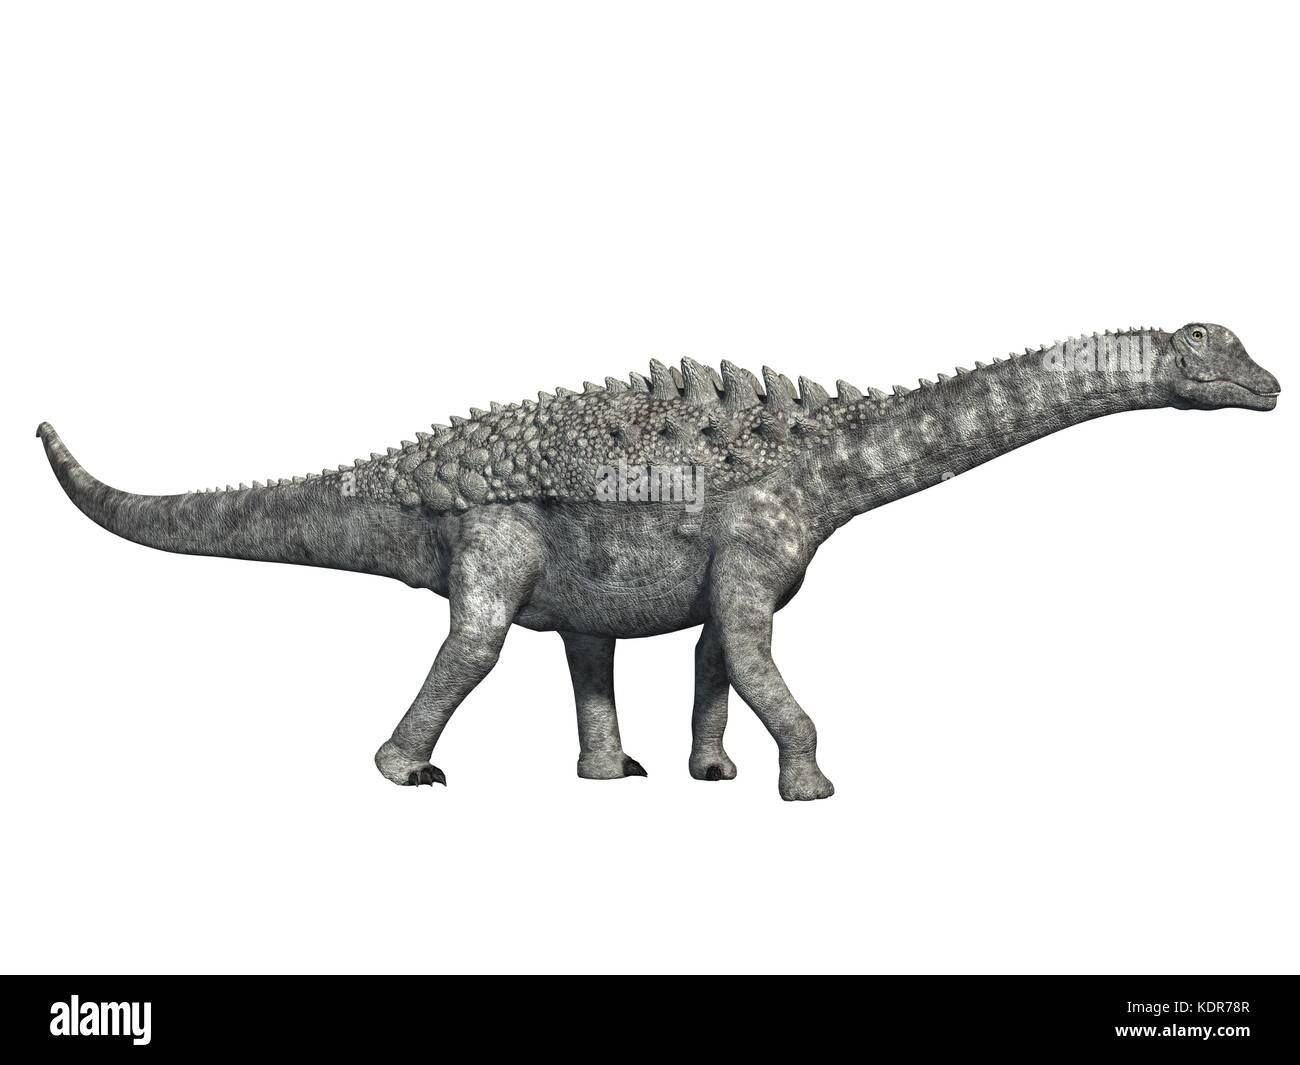 dinosaur 3d render Stock Photo